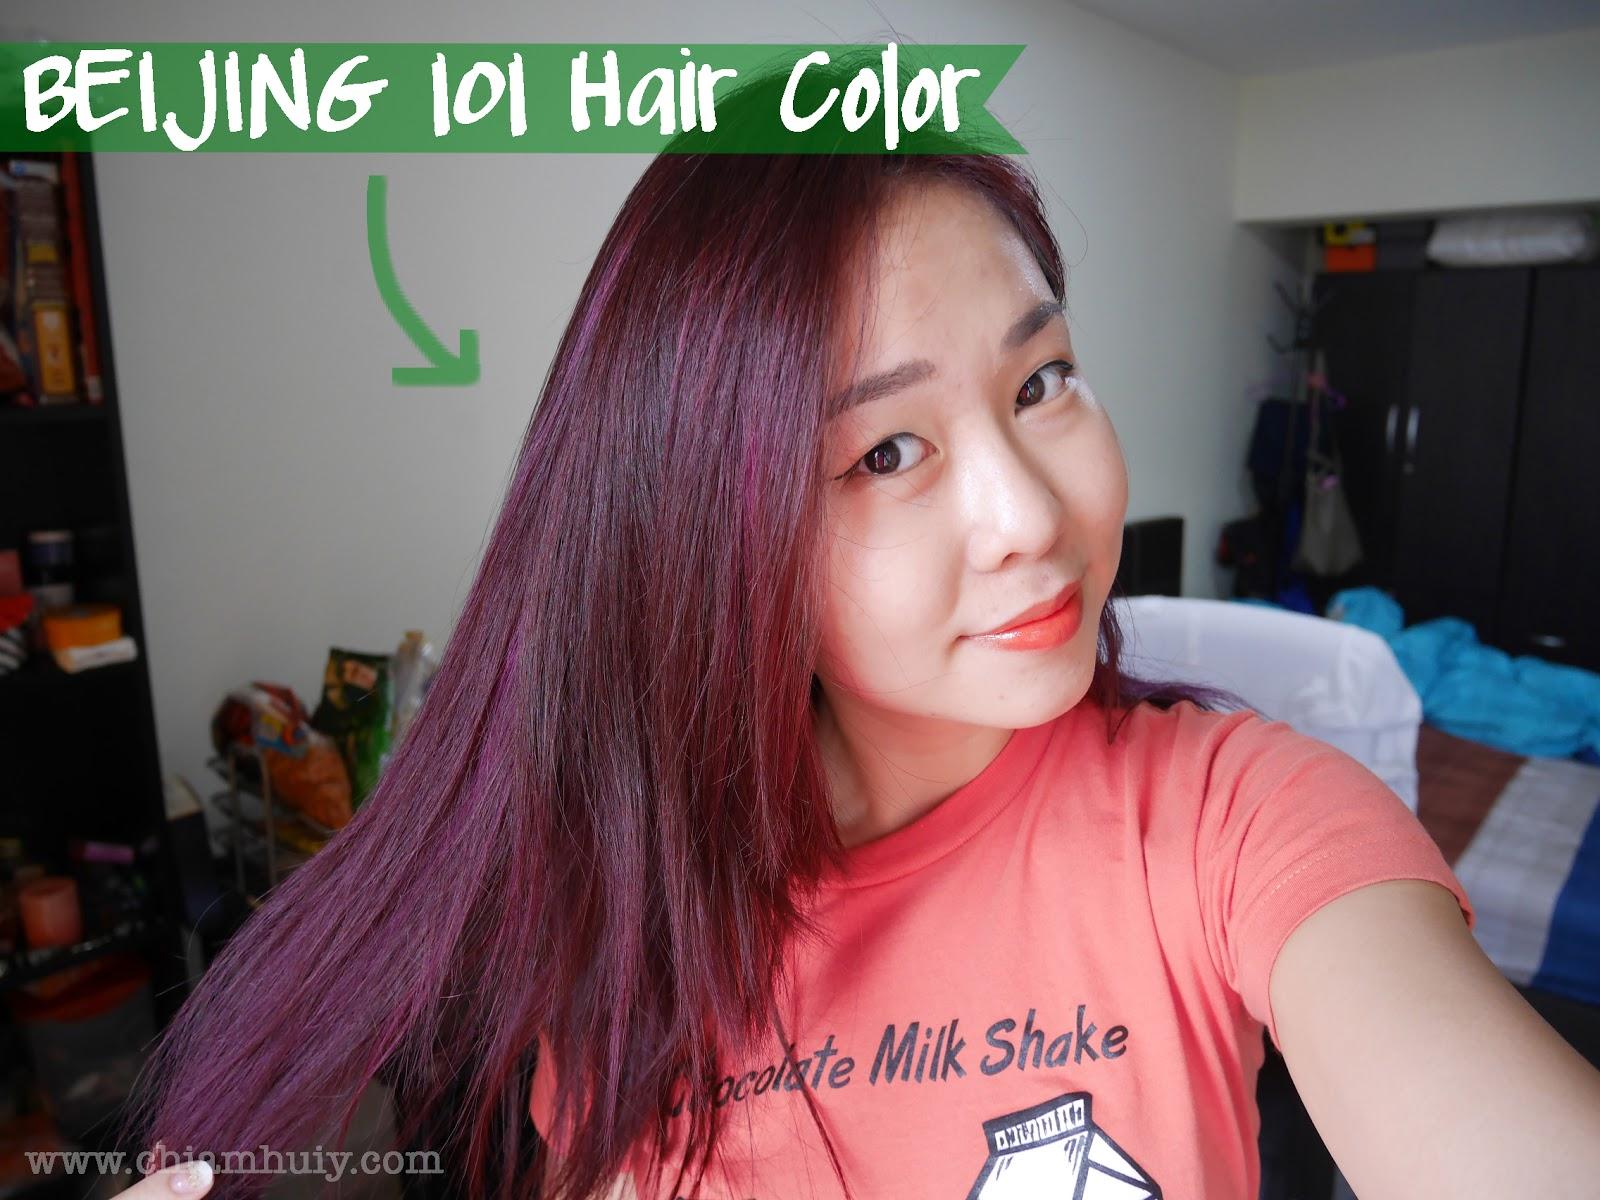 Beijing 101 Herbal Hair Dye Day  Celine Chiam